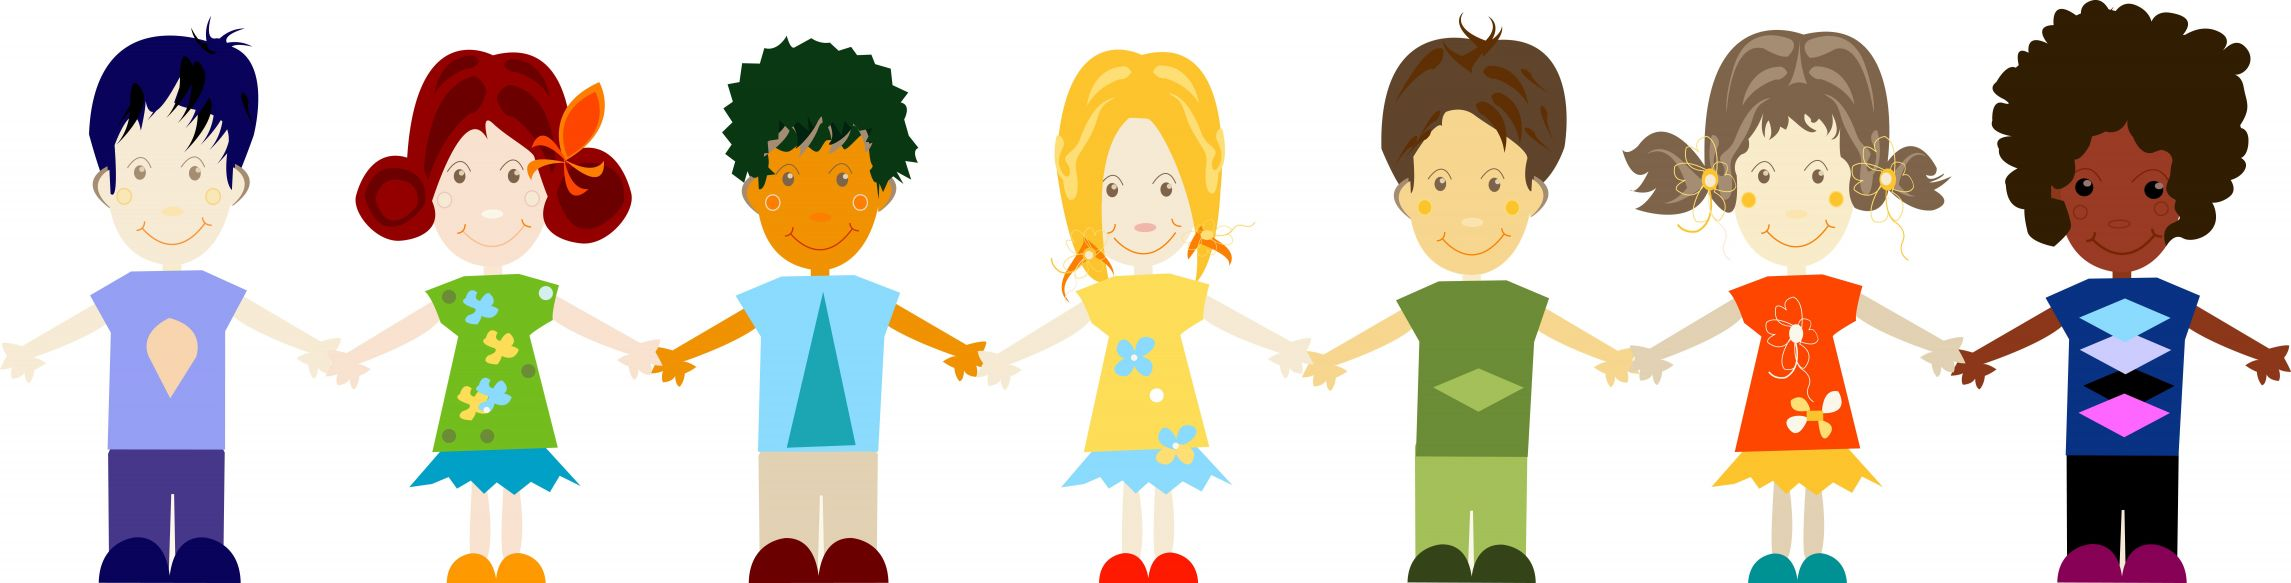 bcoz i care, pendidikan awal kanak-kanak, world, tips belajar